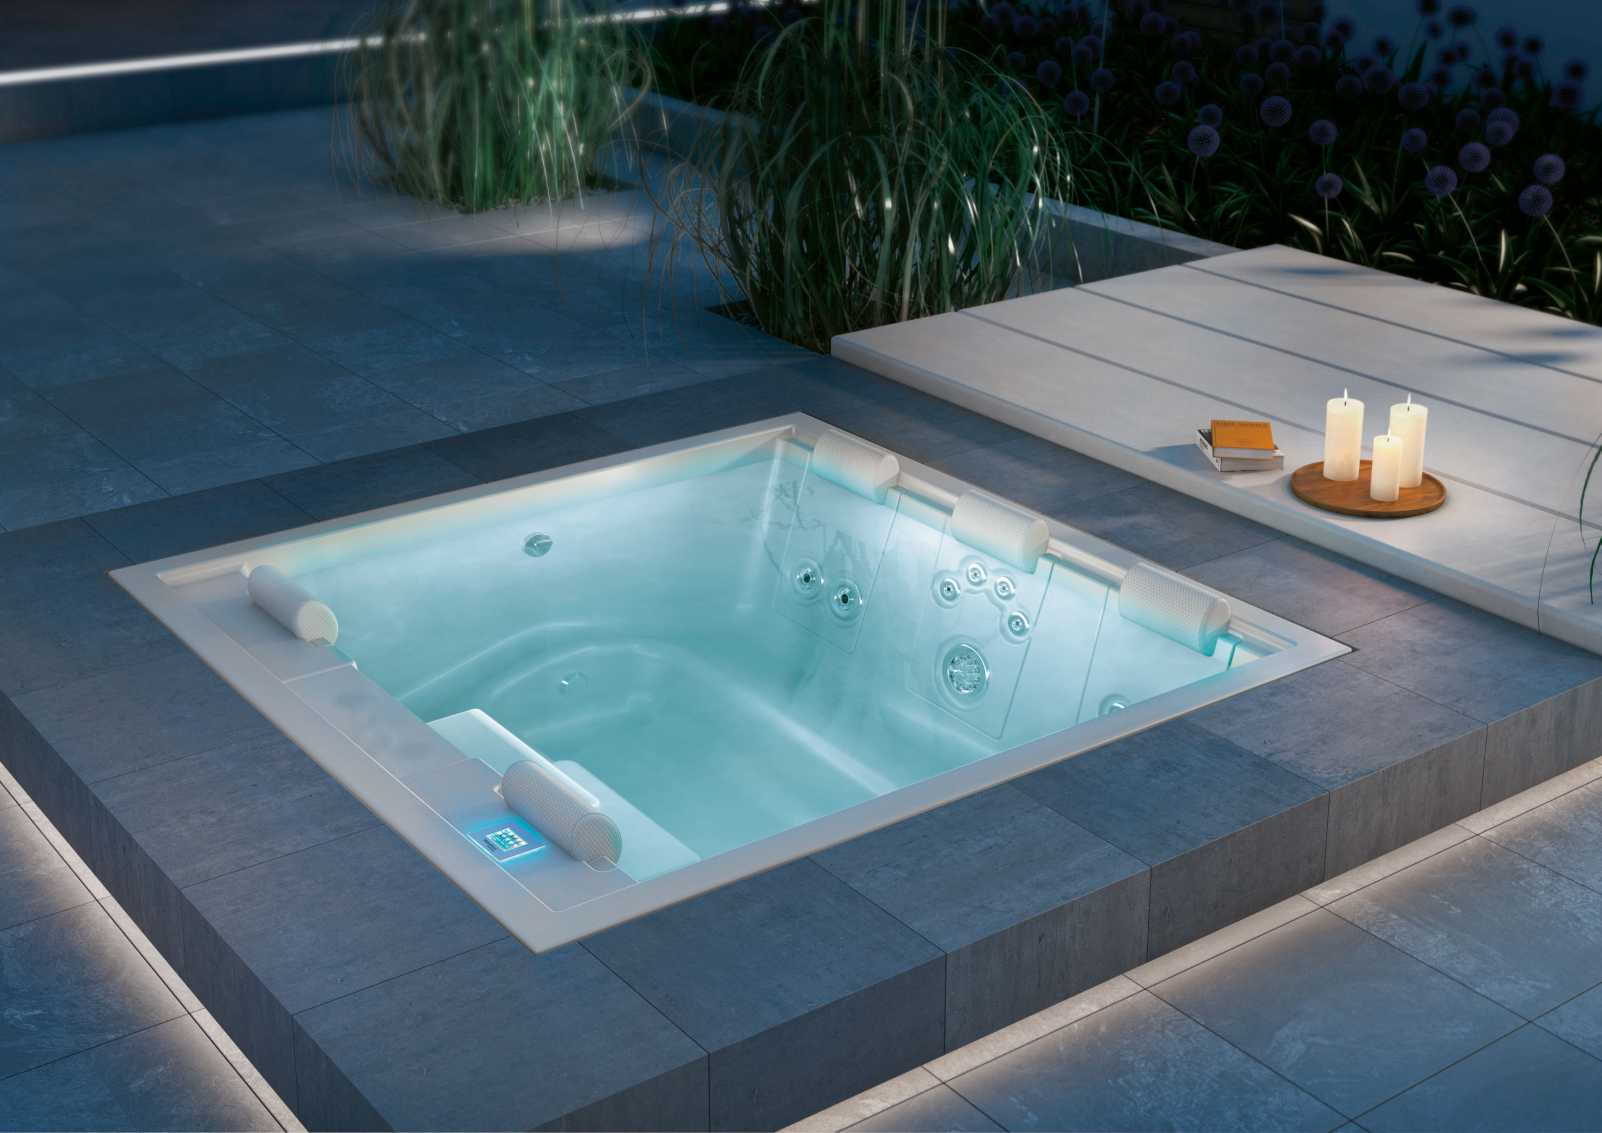 vasca-idromassaggio-esterno-2